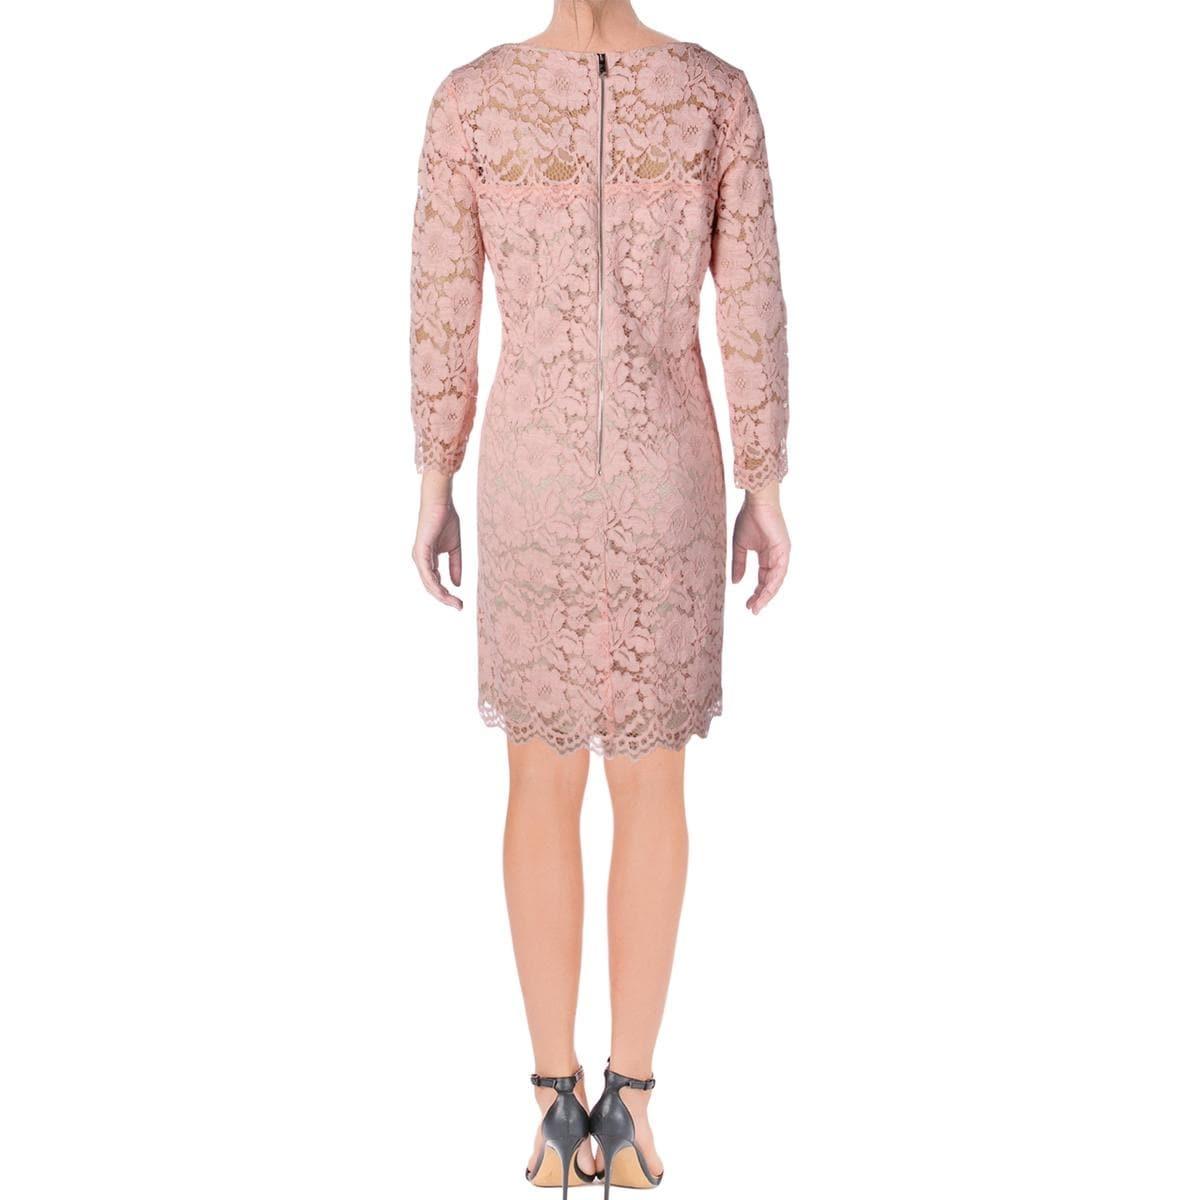 Vince Camuto Womens Party Dress Lace Bateau Neck - 12 - Free ...